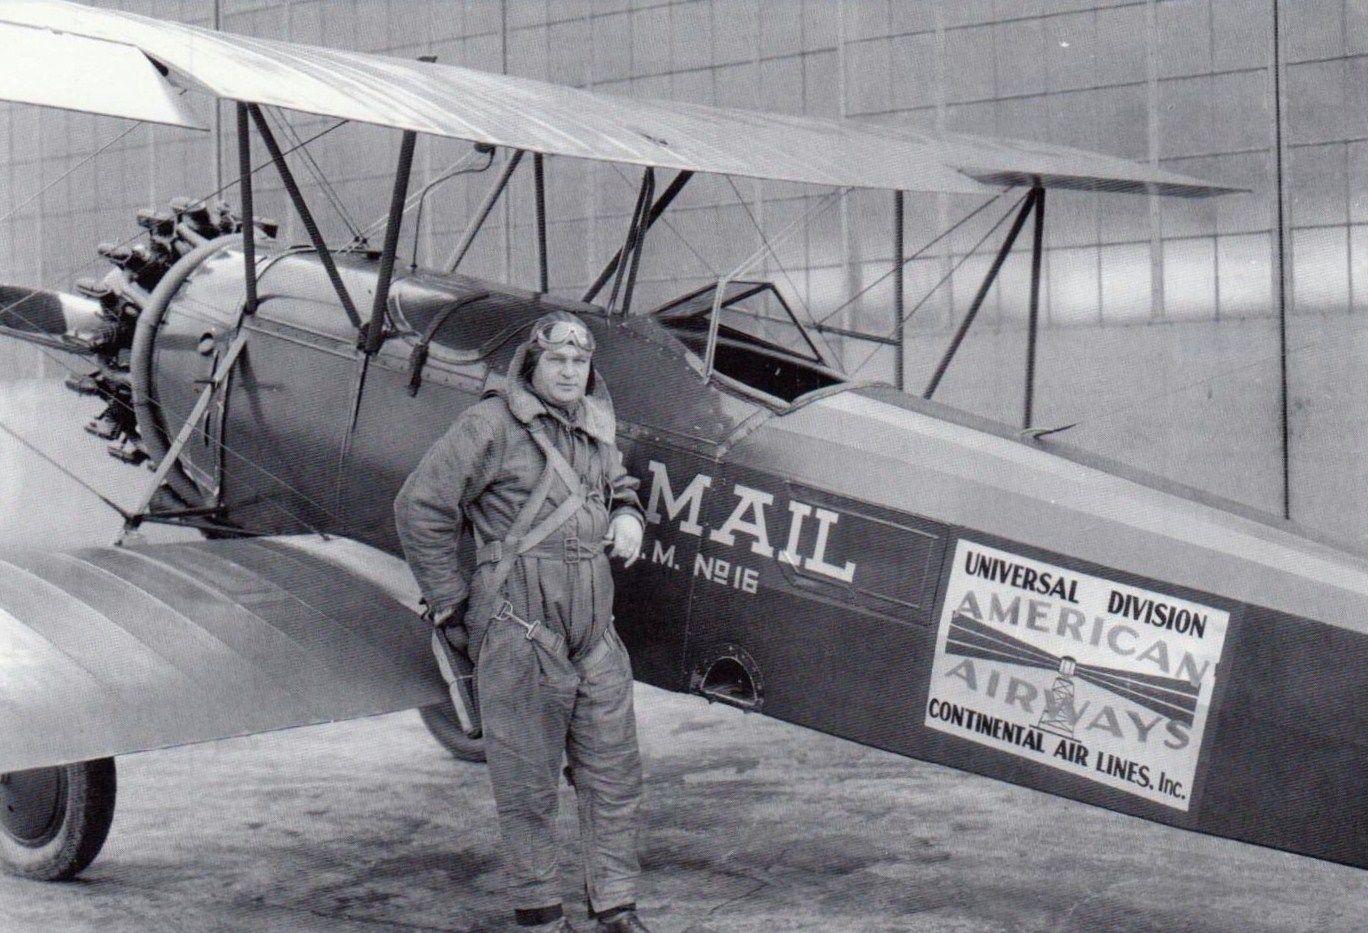 1935 Bowman Field U S Mail Pilot Aviation Insurance Vintage